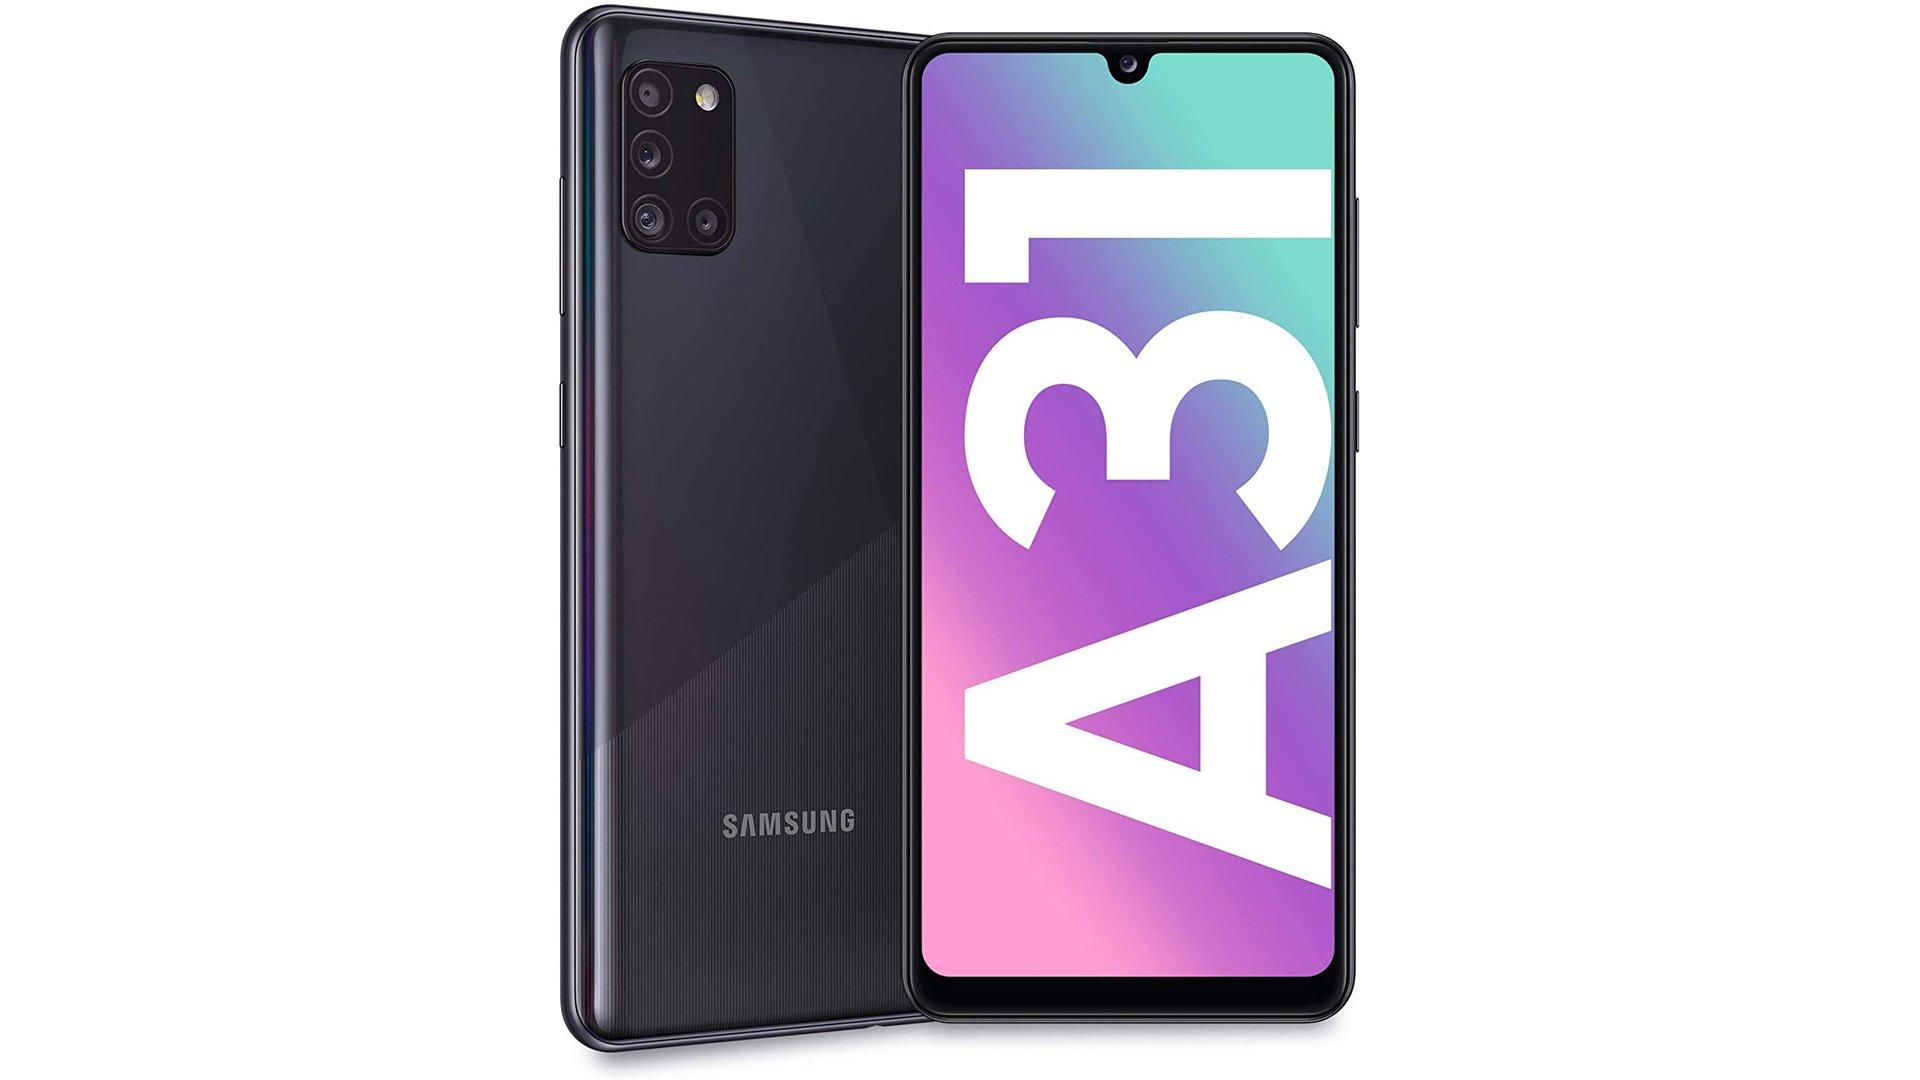 Get 50% off Samsung Galaxy A31 on Aliexpress.